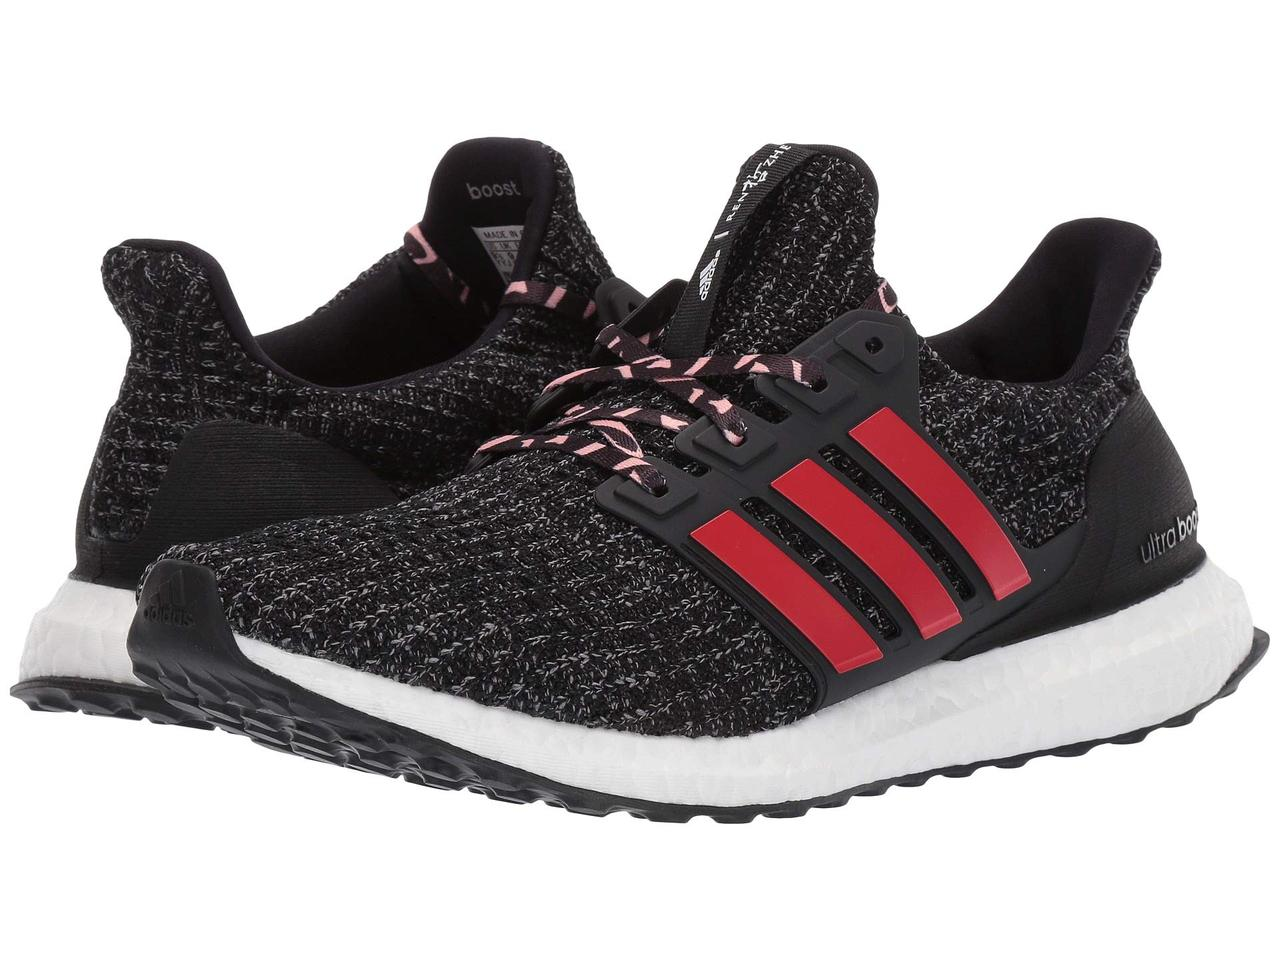 8922274655c8e6 Кроссовки/Кеды (Оригинал) adidas Running UltraBOOST Core Black/Scarlet/Grey  Three